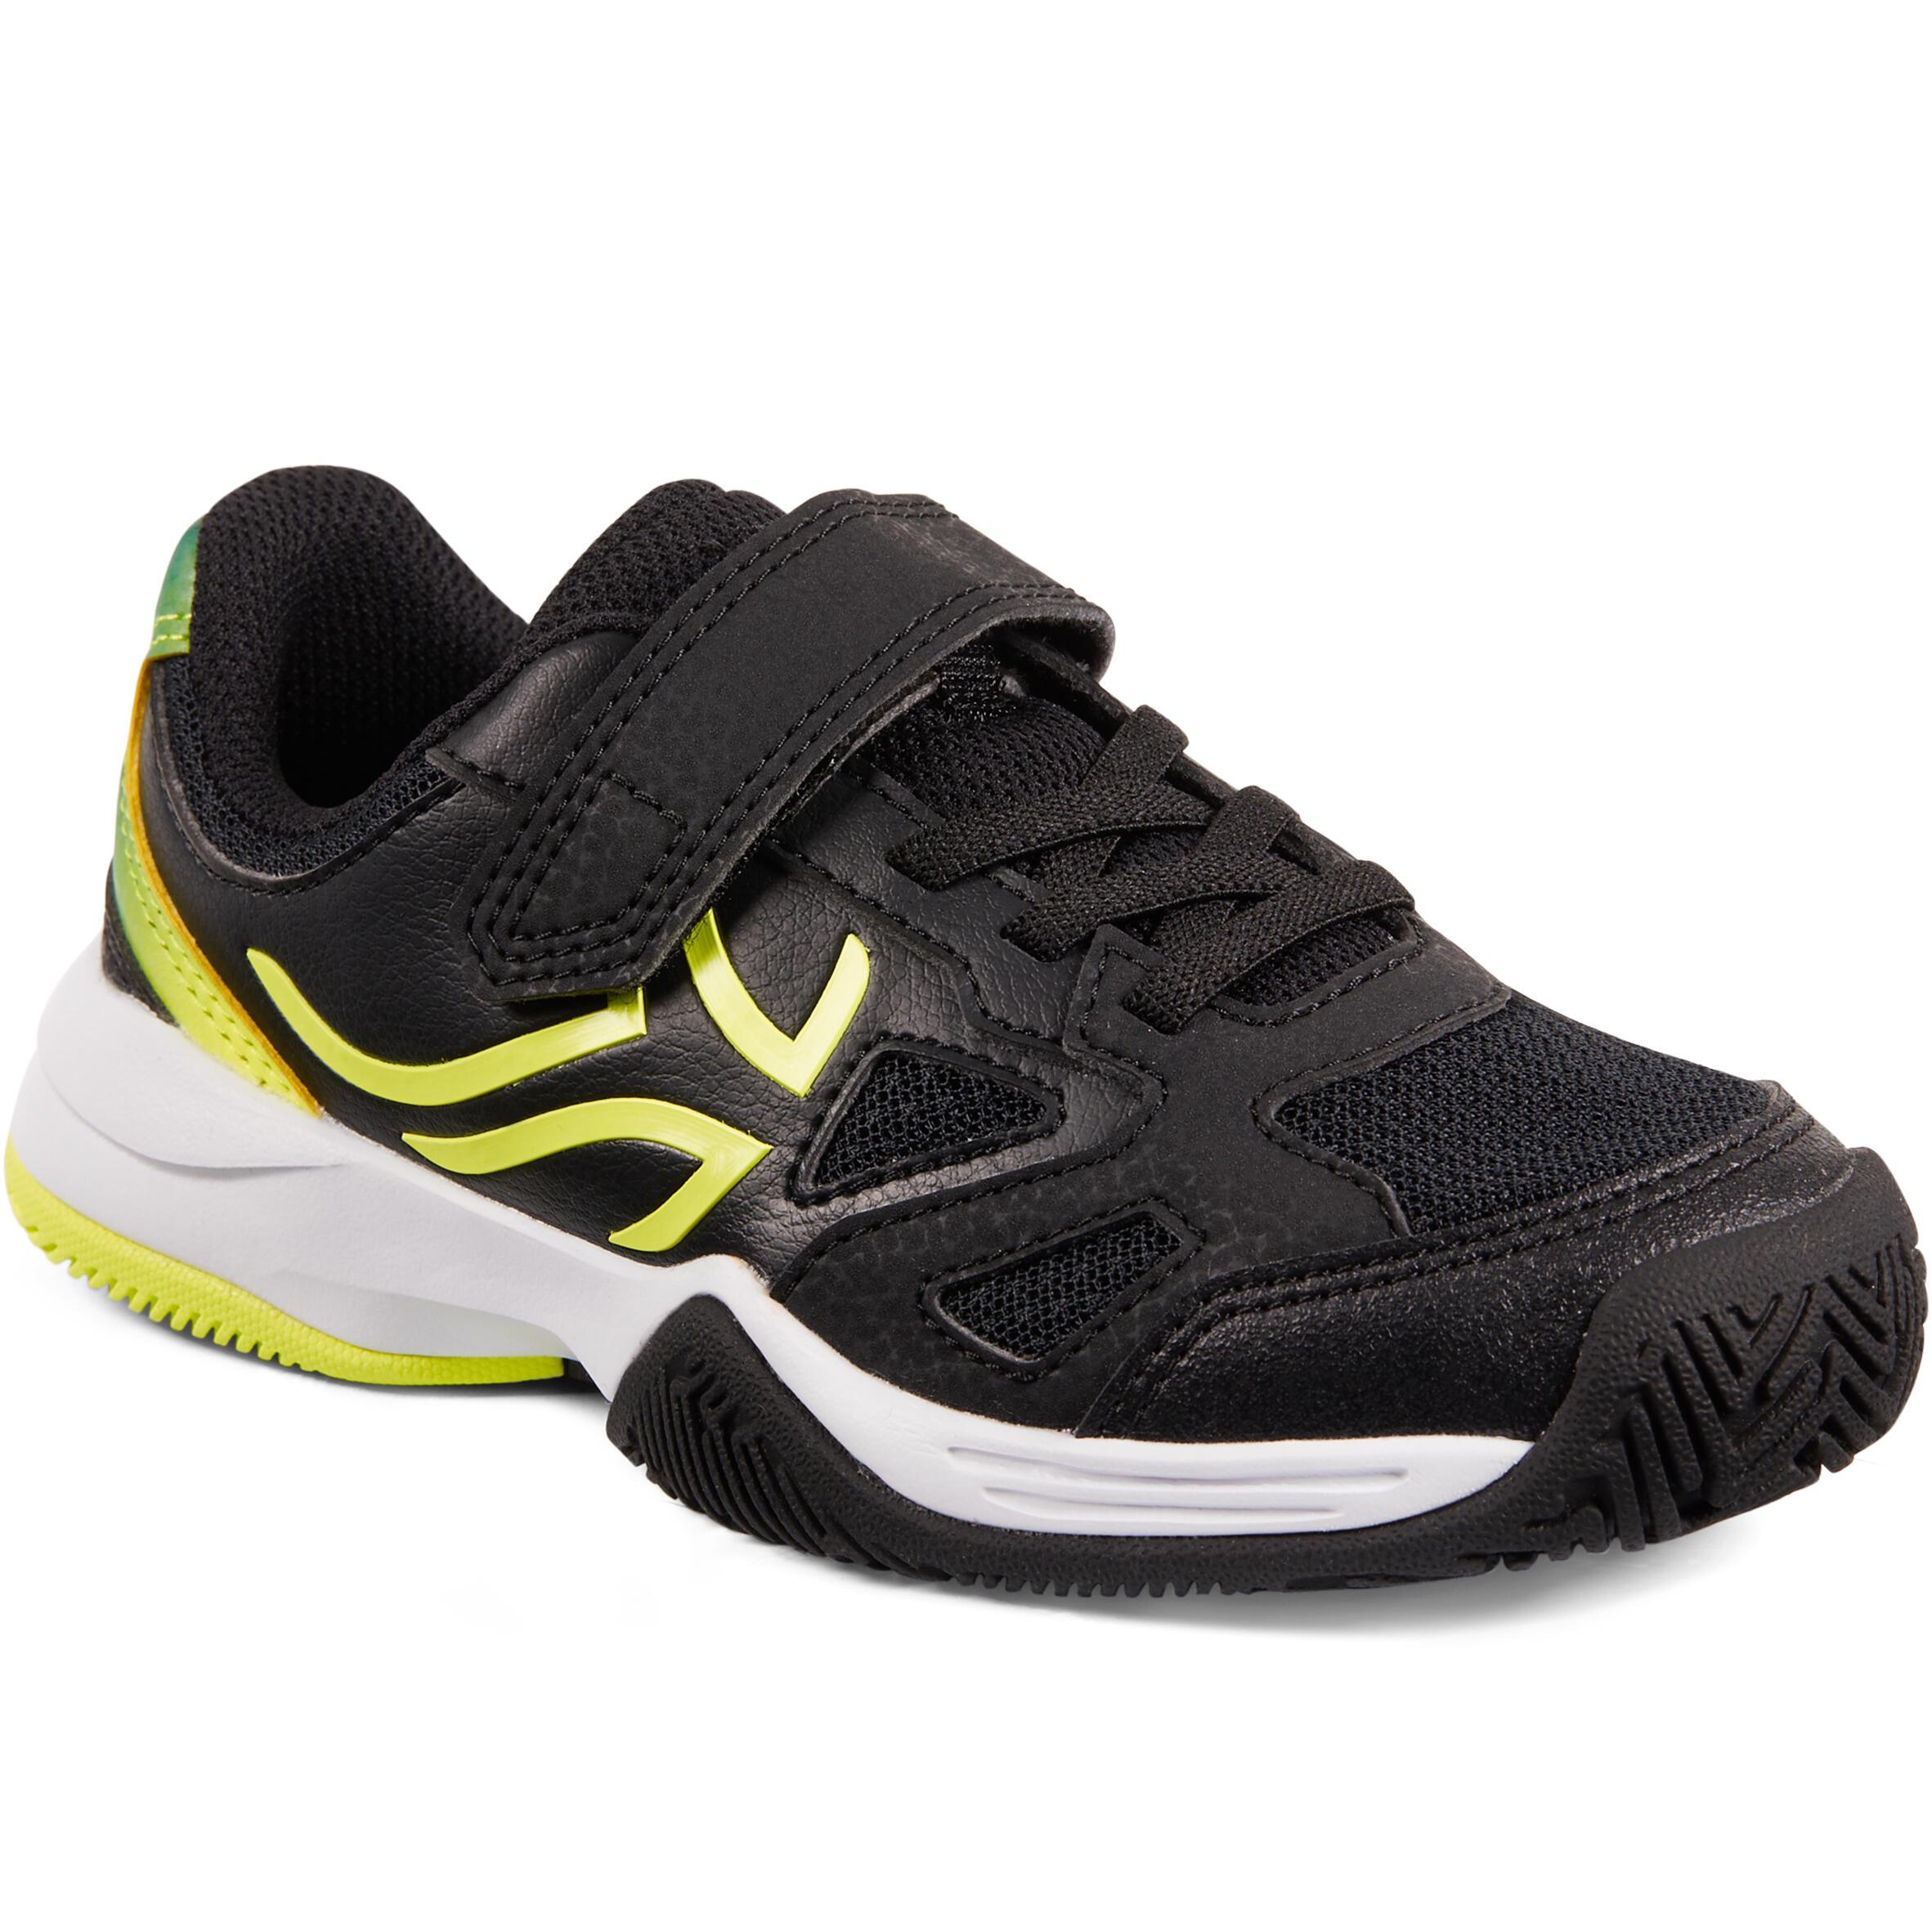 TS560 KD Kids' Tennis Shoes - Black